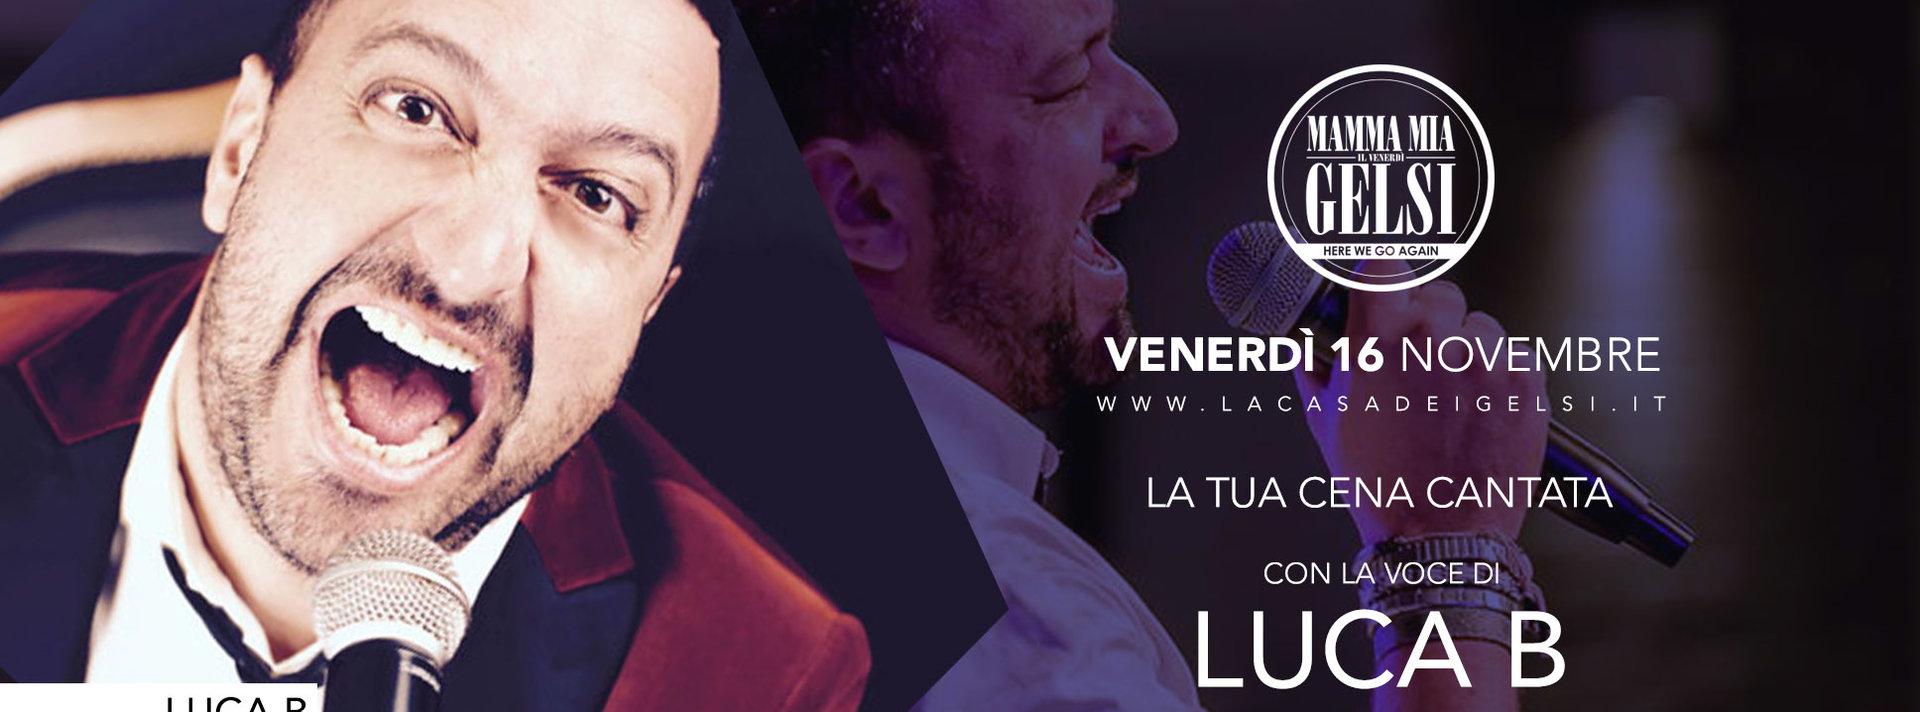 Luca B ai Gelsi - 16 novembre 2018